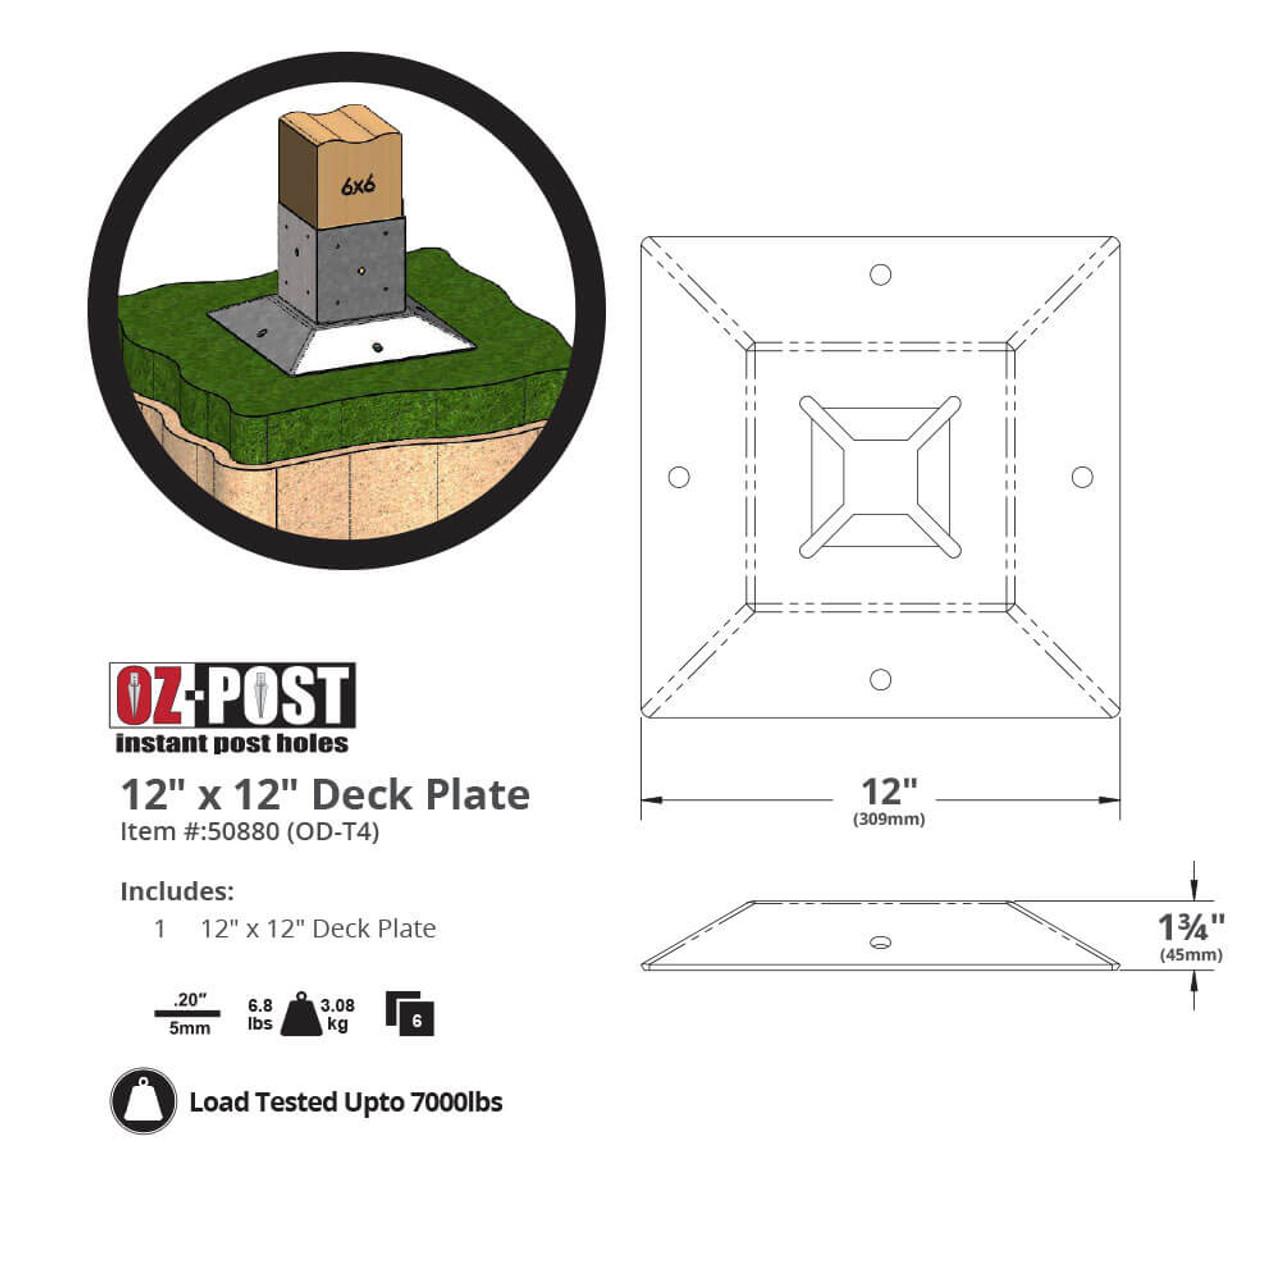 OZ-Deck OD-T4 Dimension Drawing